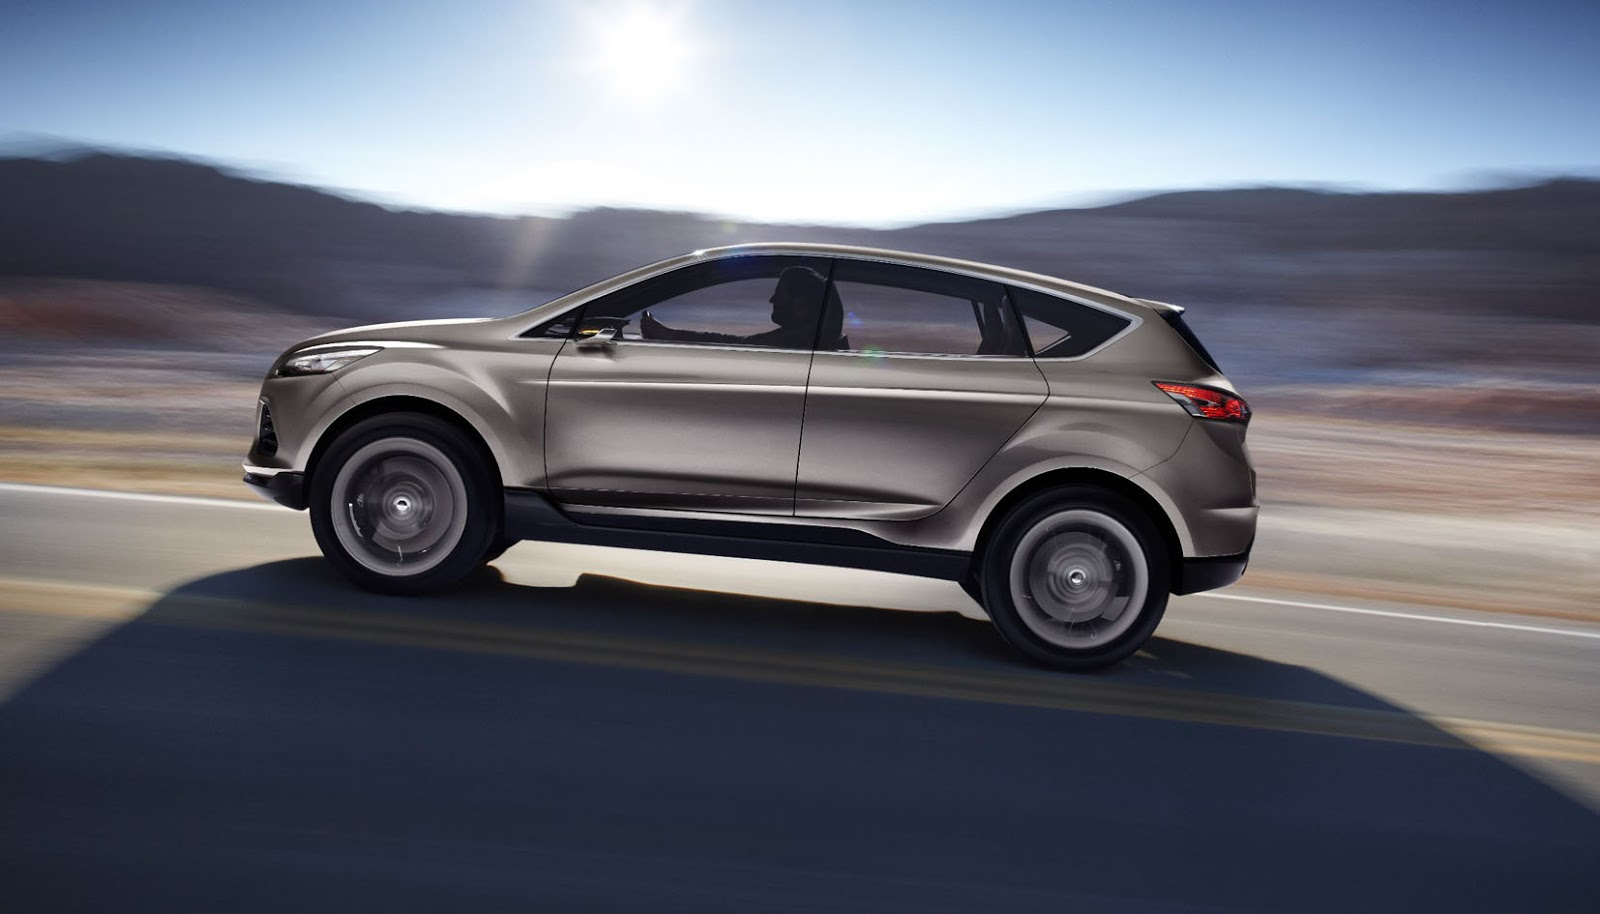 Ford apresenta o conceito vertrek utilitrio esportivo compacto ford apresenta o conceito vertrek utilitrio esportivo compacto elegante e fluido fandeluxe Image collections